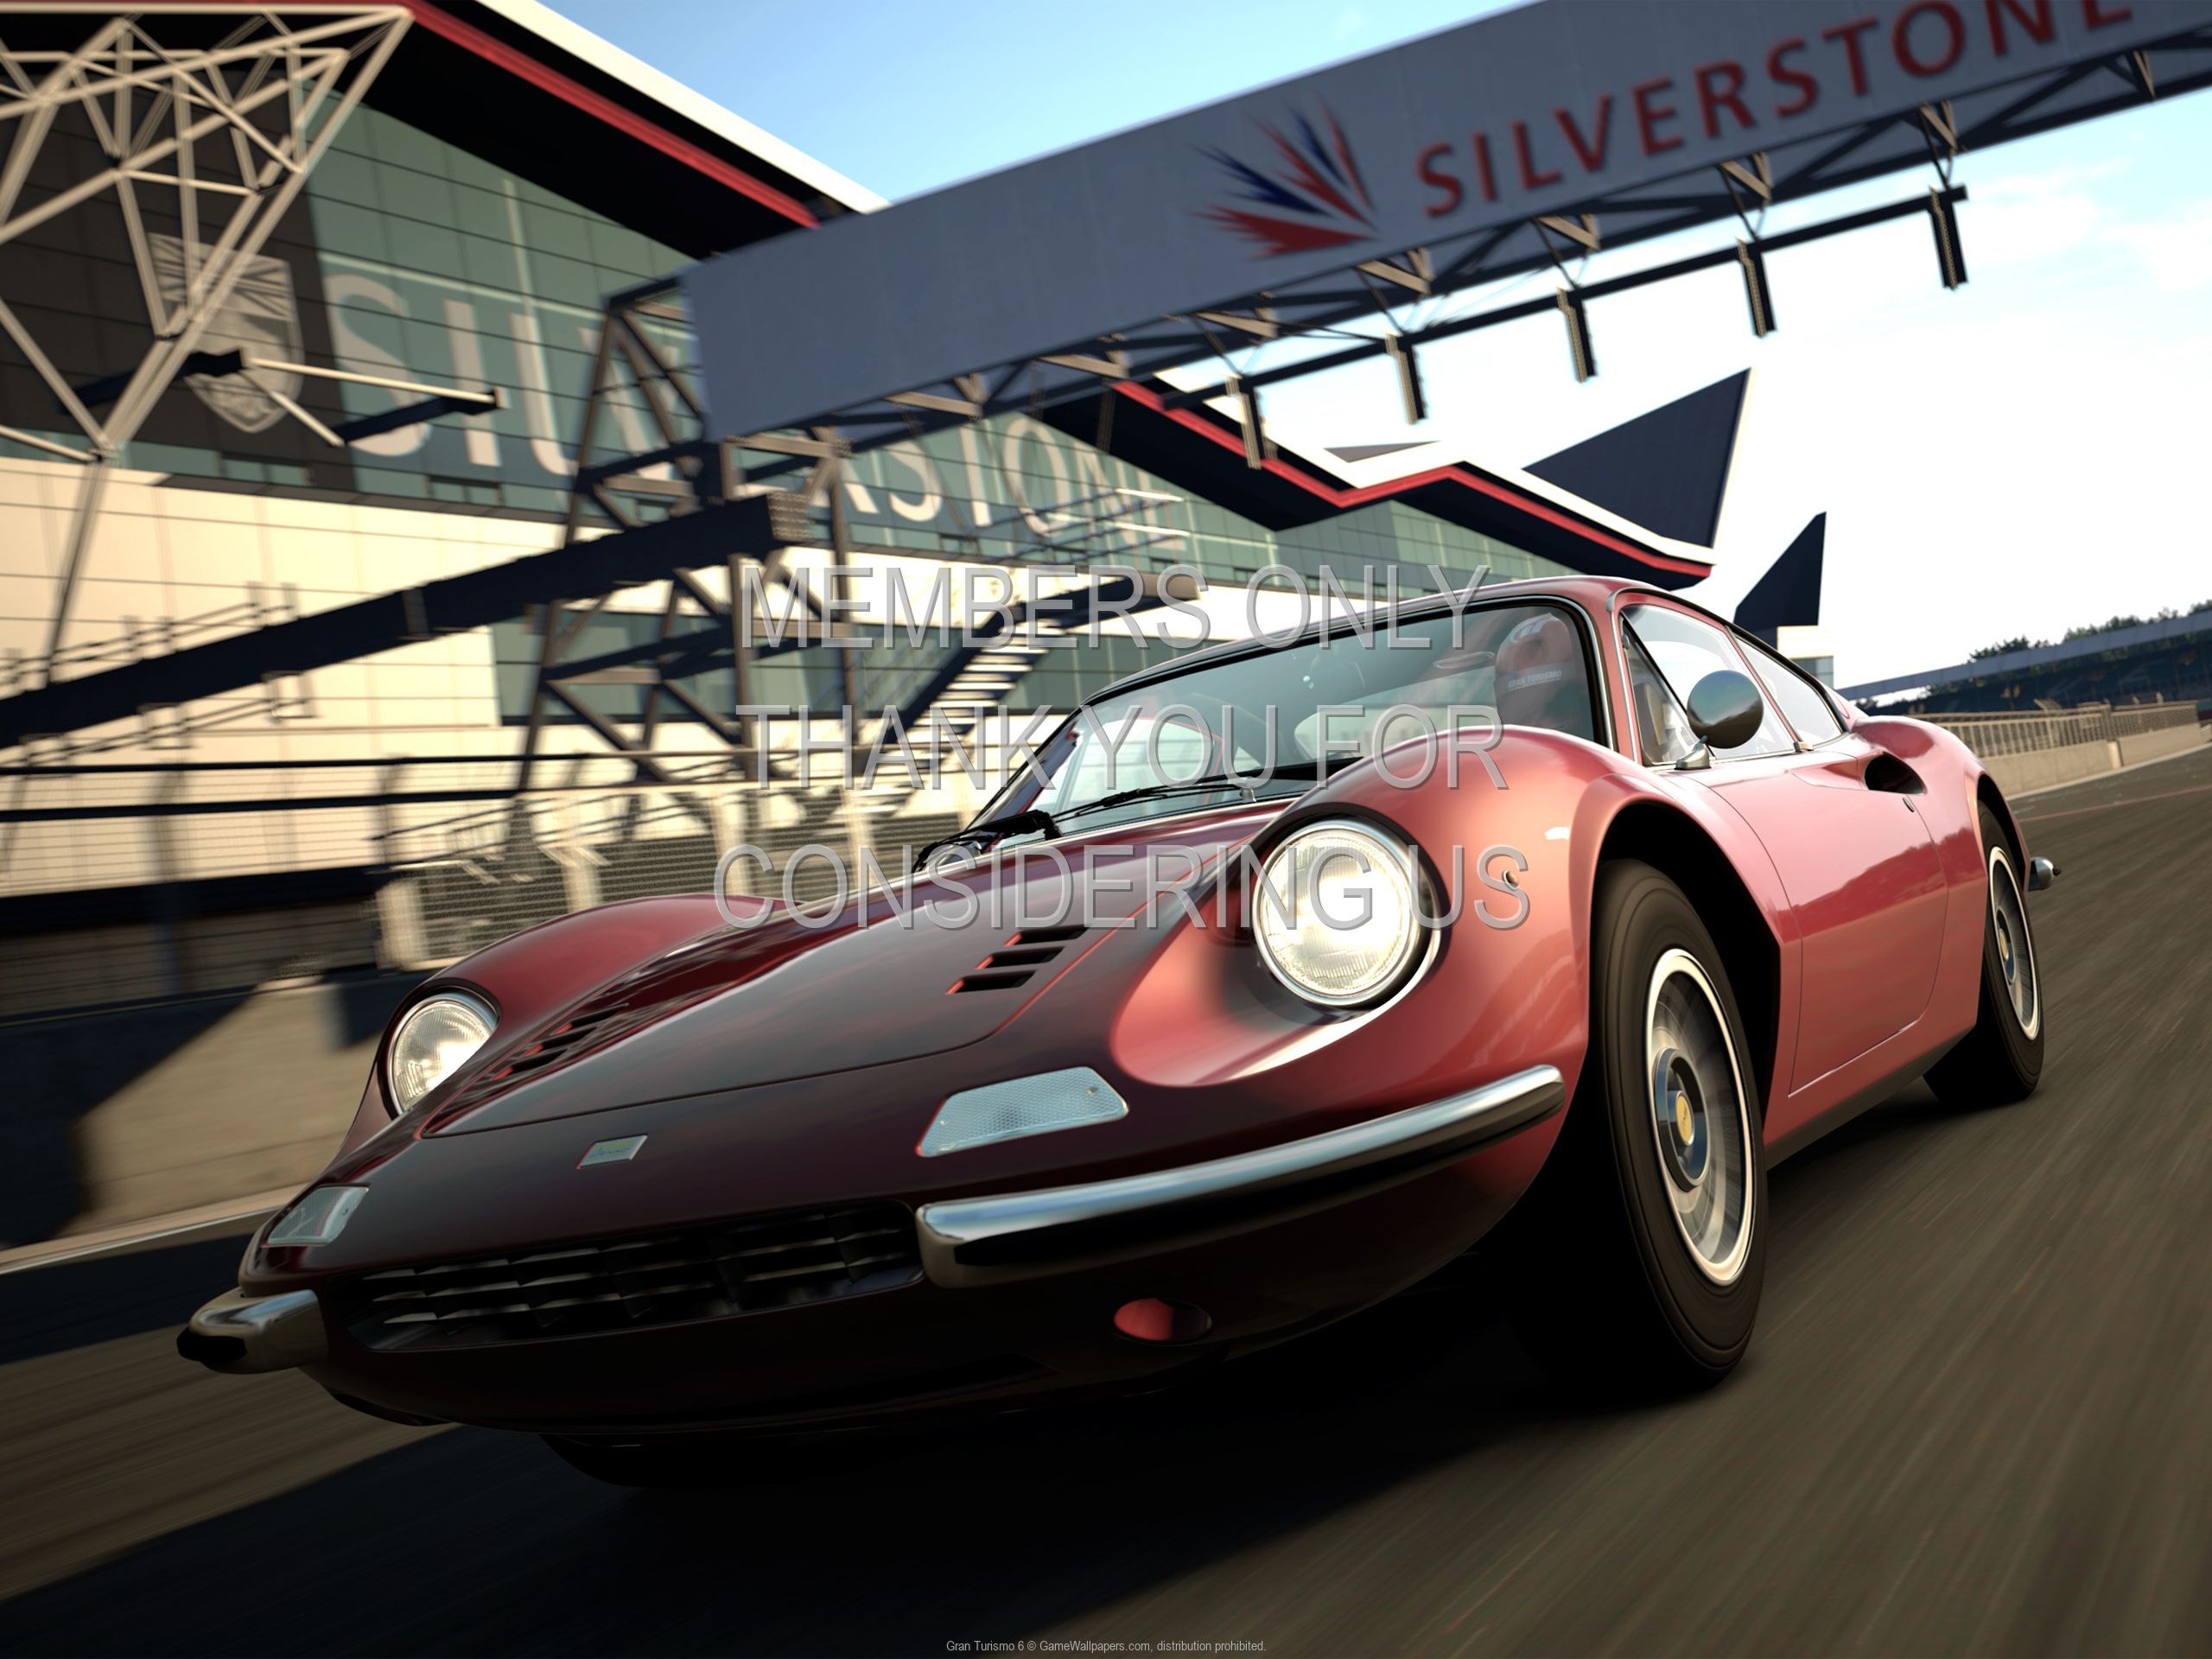 Gran Turismo 6 1920x1080 Handy Hintergrundbild 02